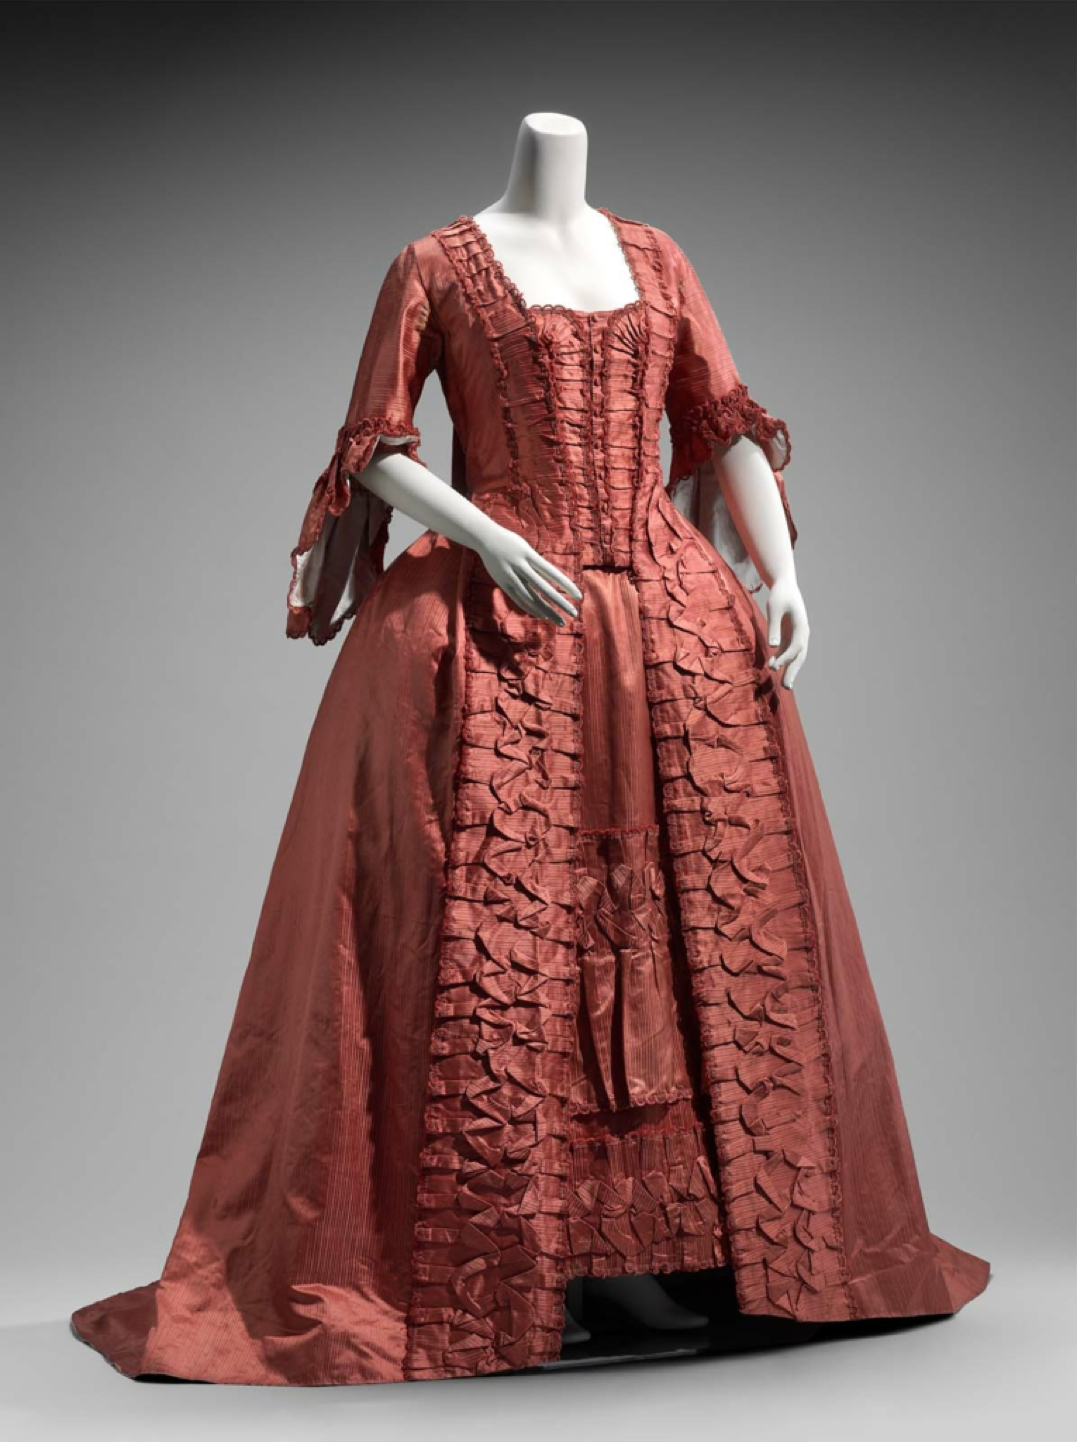 Museum of Fine Arts Boston (1760s - France)